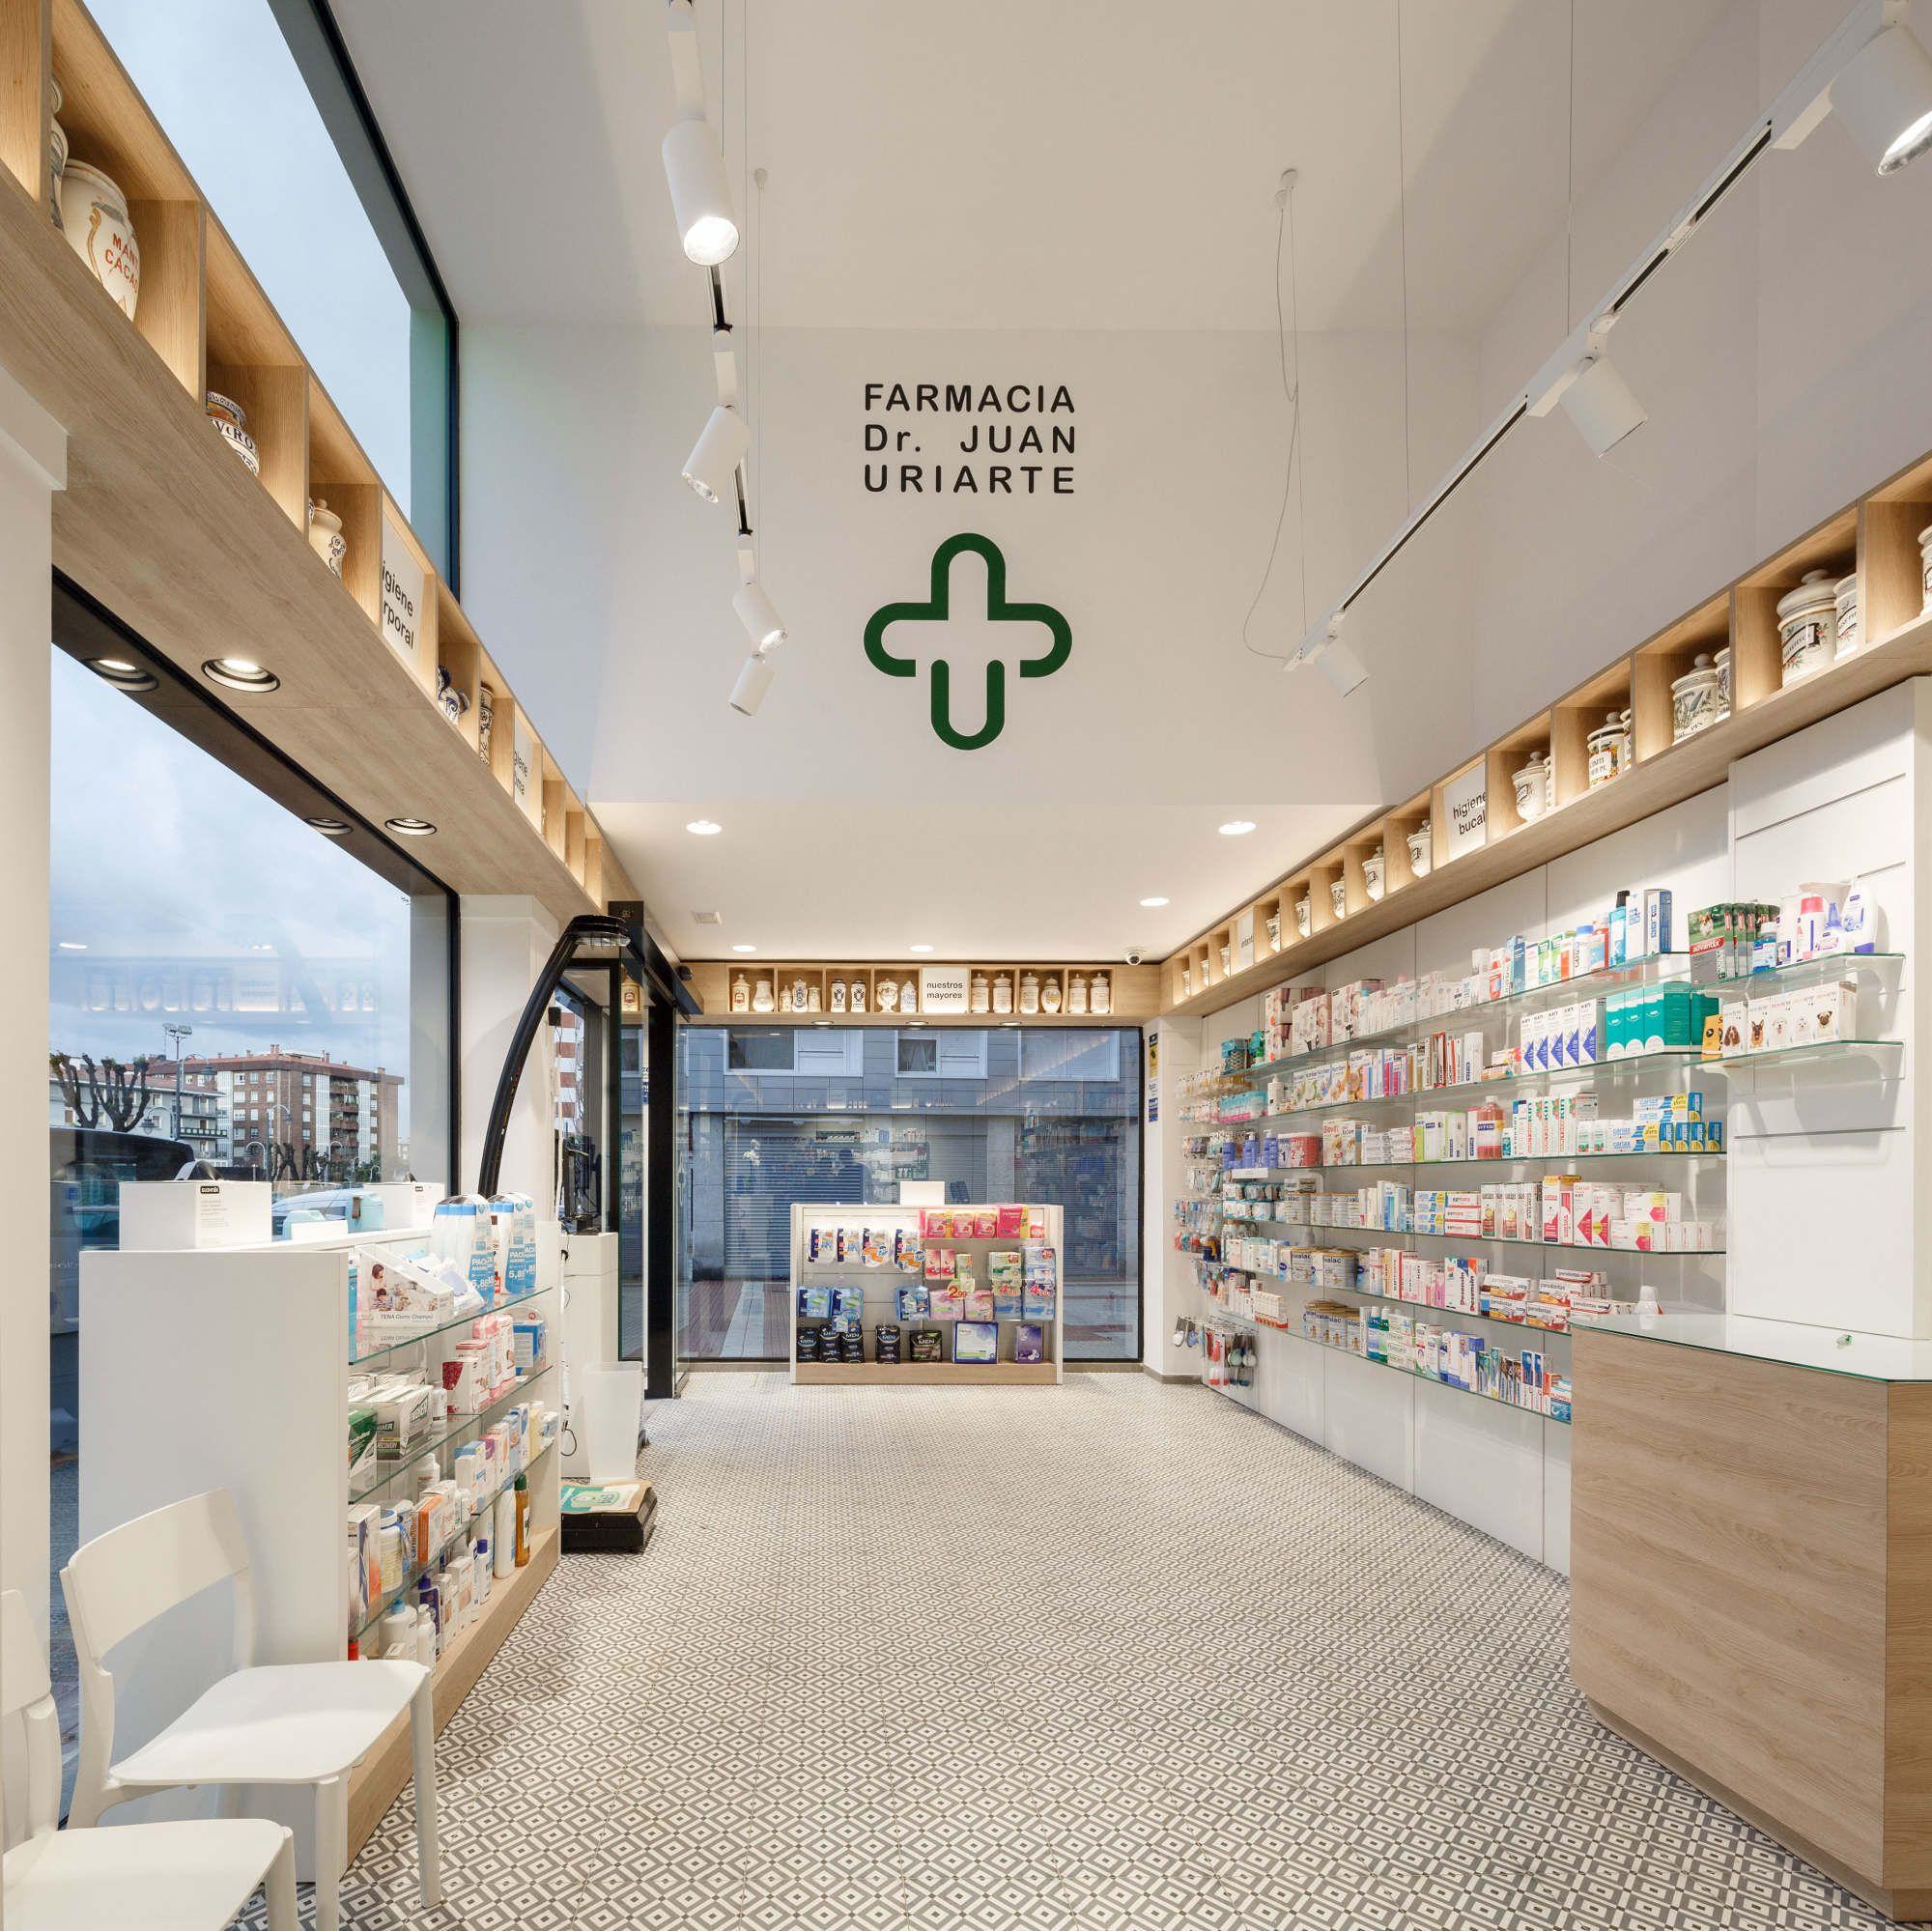 Farmacia dr juan uriarte bilbao enrique polo estudio - Estudio arquitectura bilbao ...